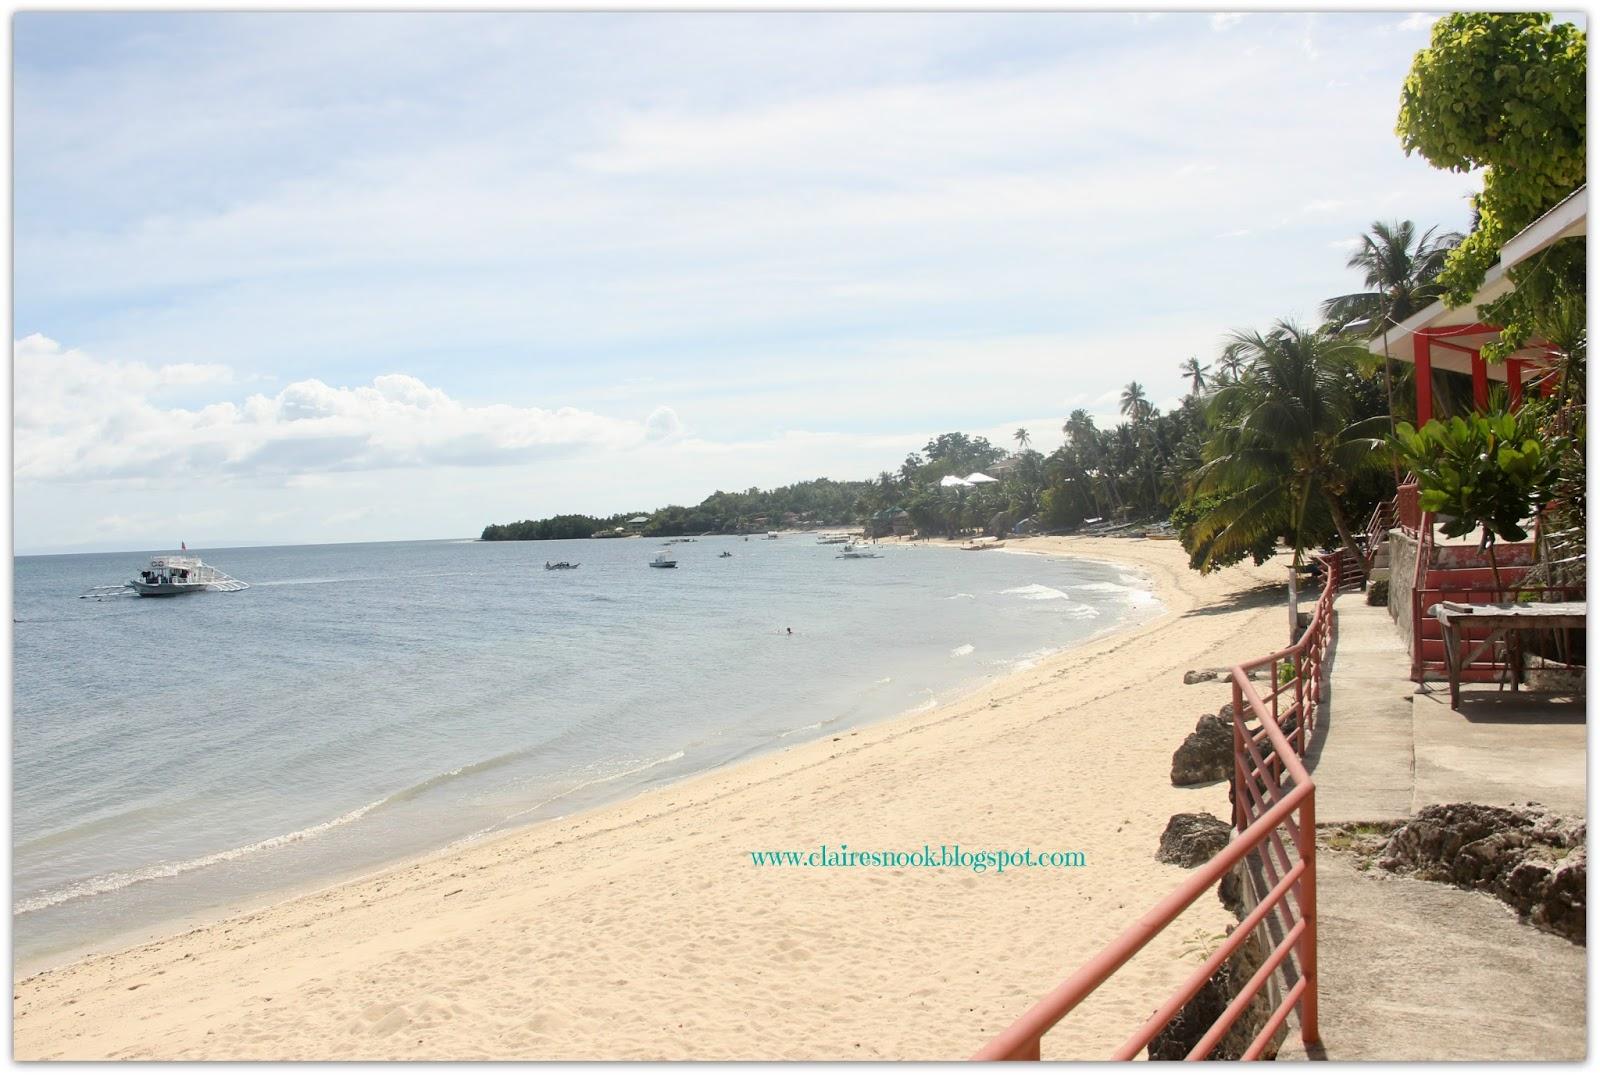 Cartagena Beachwalk Resort Alcoy Cebu